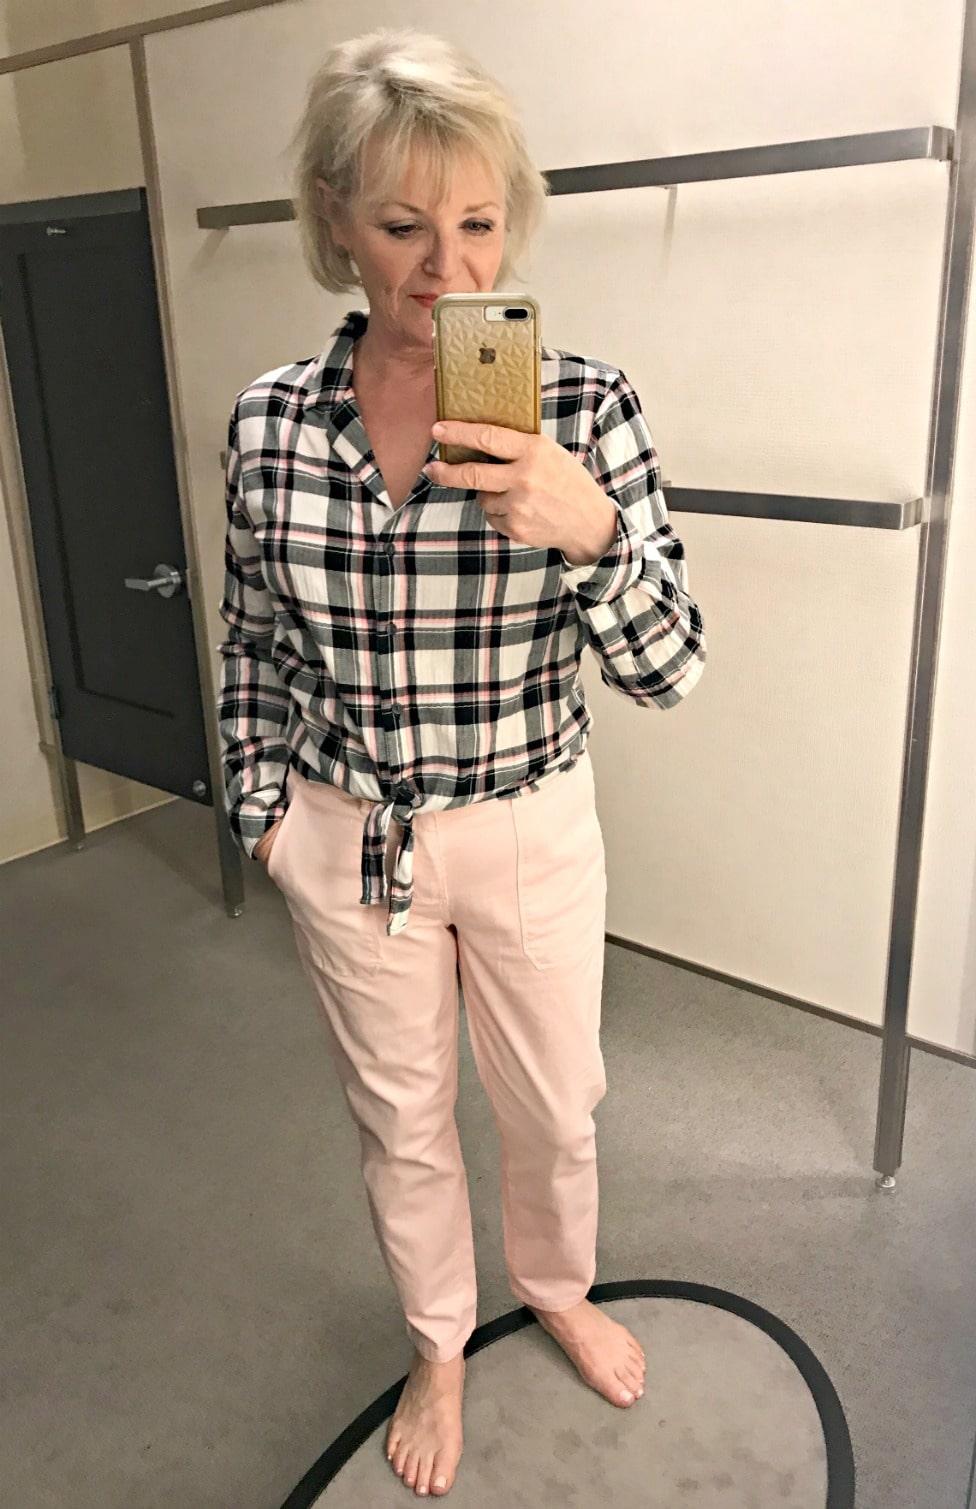 Jennifer Connolly wearing plaid shirt and pink pants